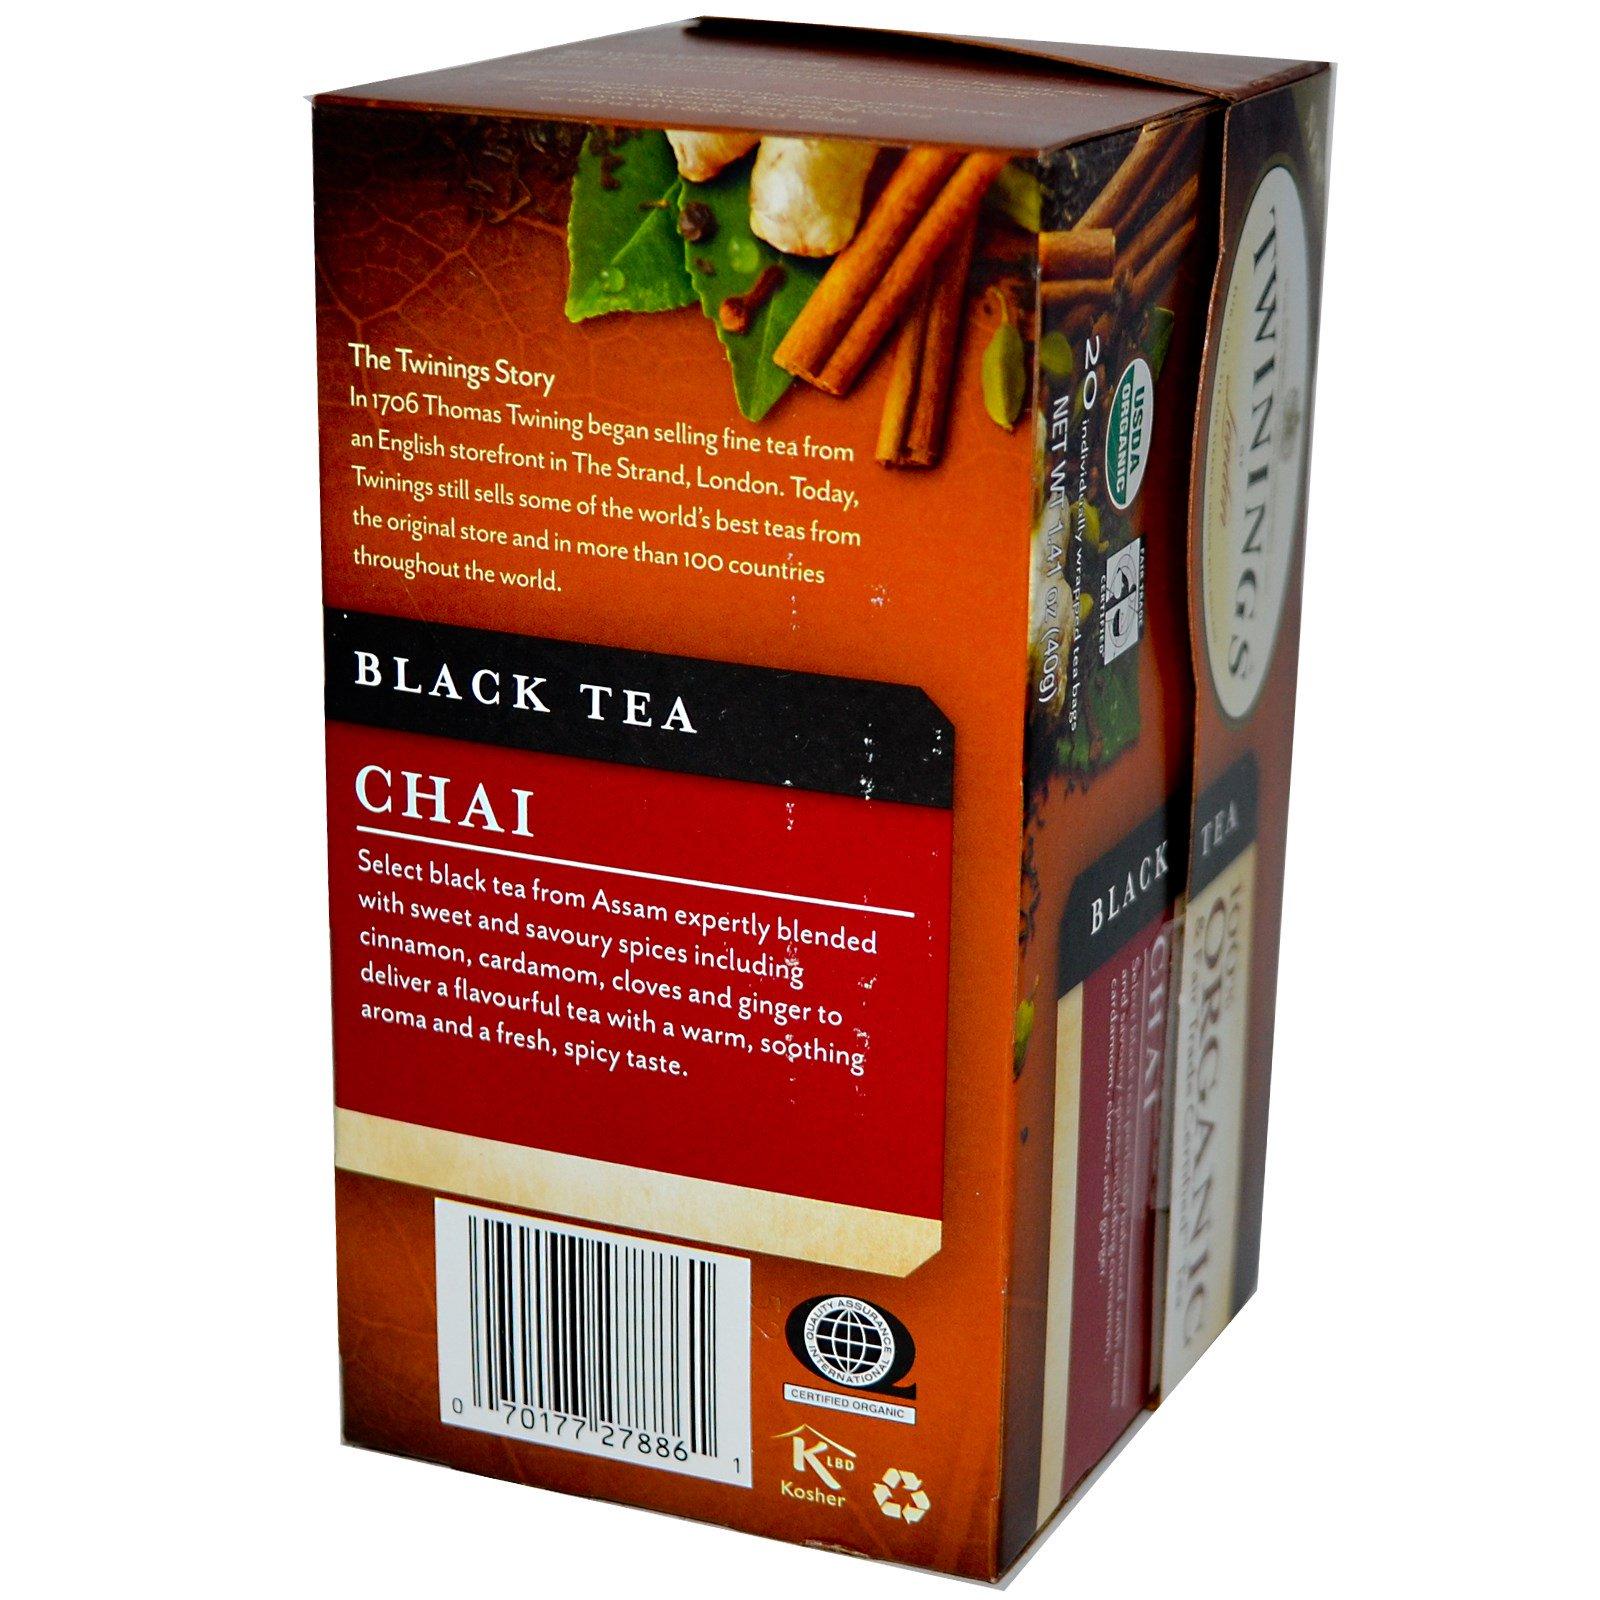 Twinings, 100% Organic Black Tea, Chai, 20 Tea Bags, 1.41 oz